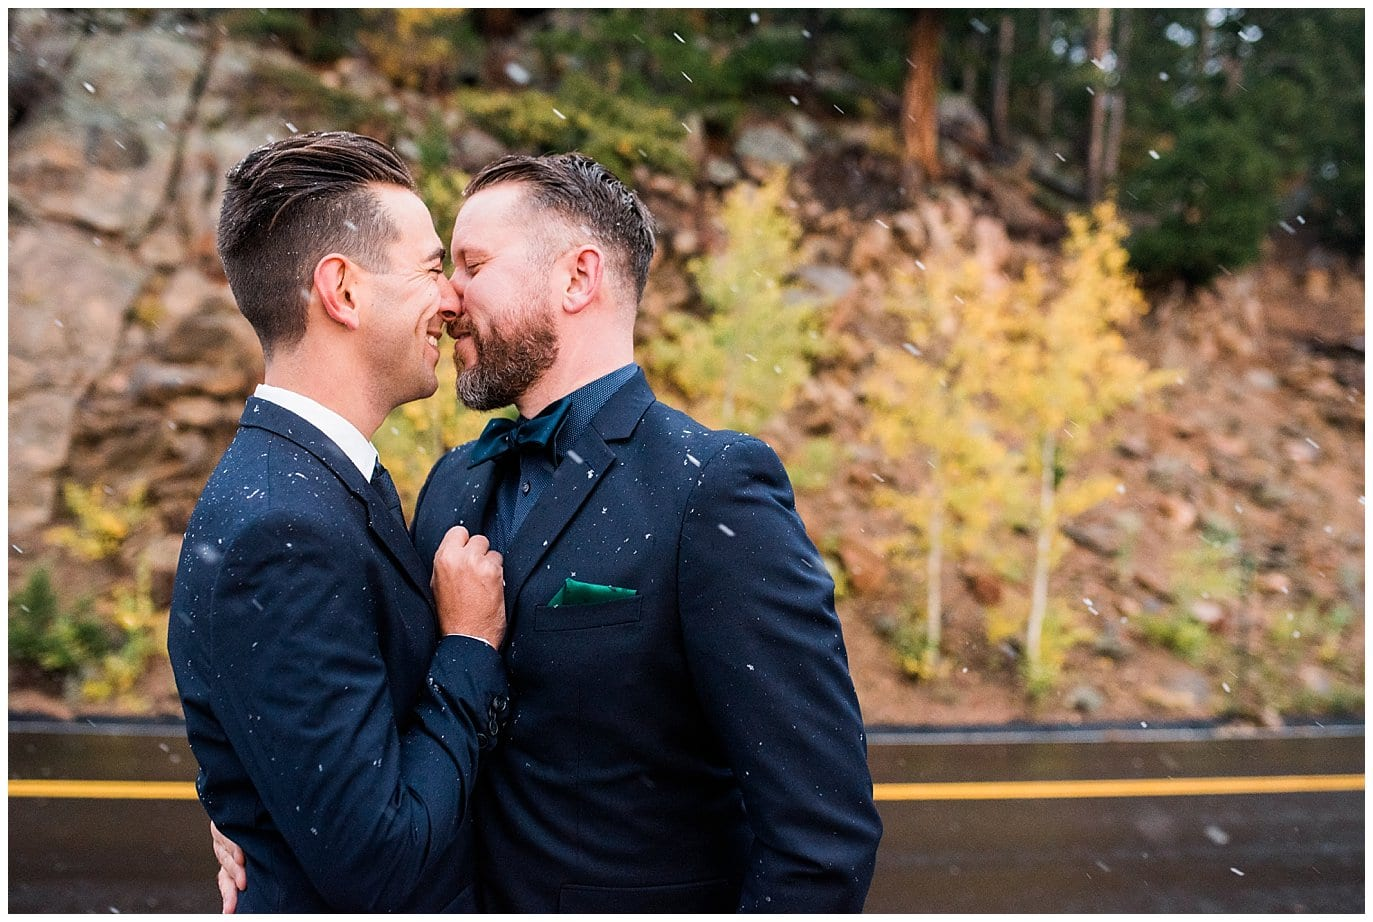 Trail-Ridge Road Same-sex Elopement photo